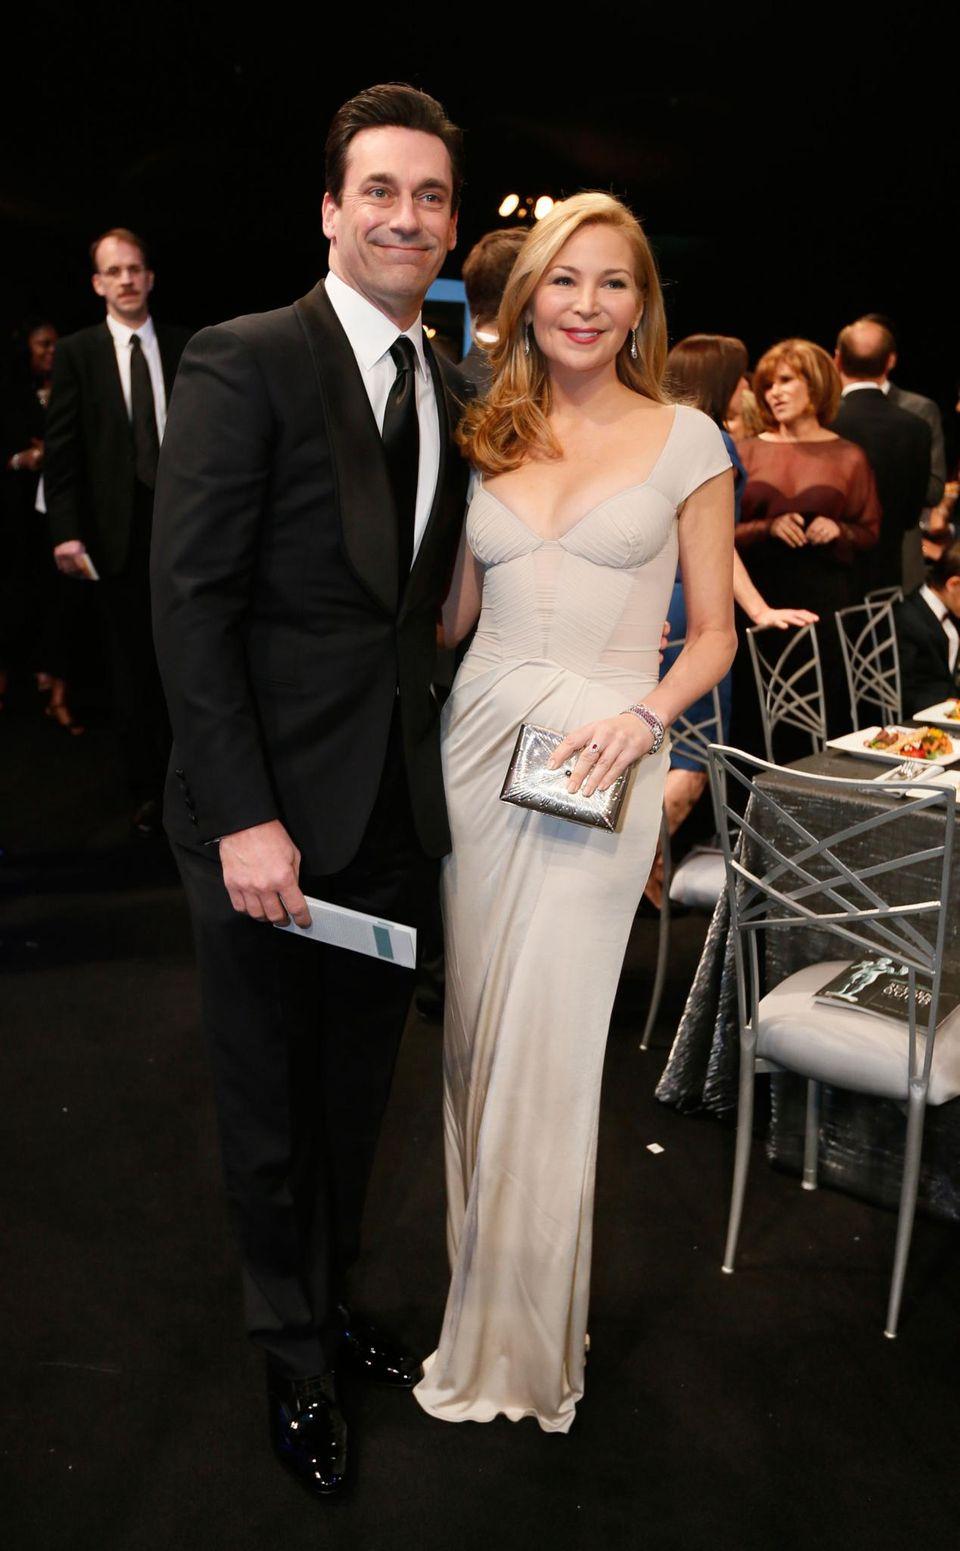 Jon Hamm und seine Partnerin Jennifer Westfeldt